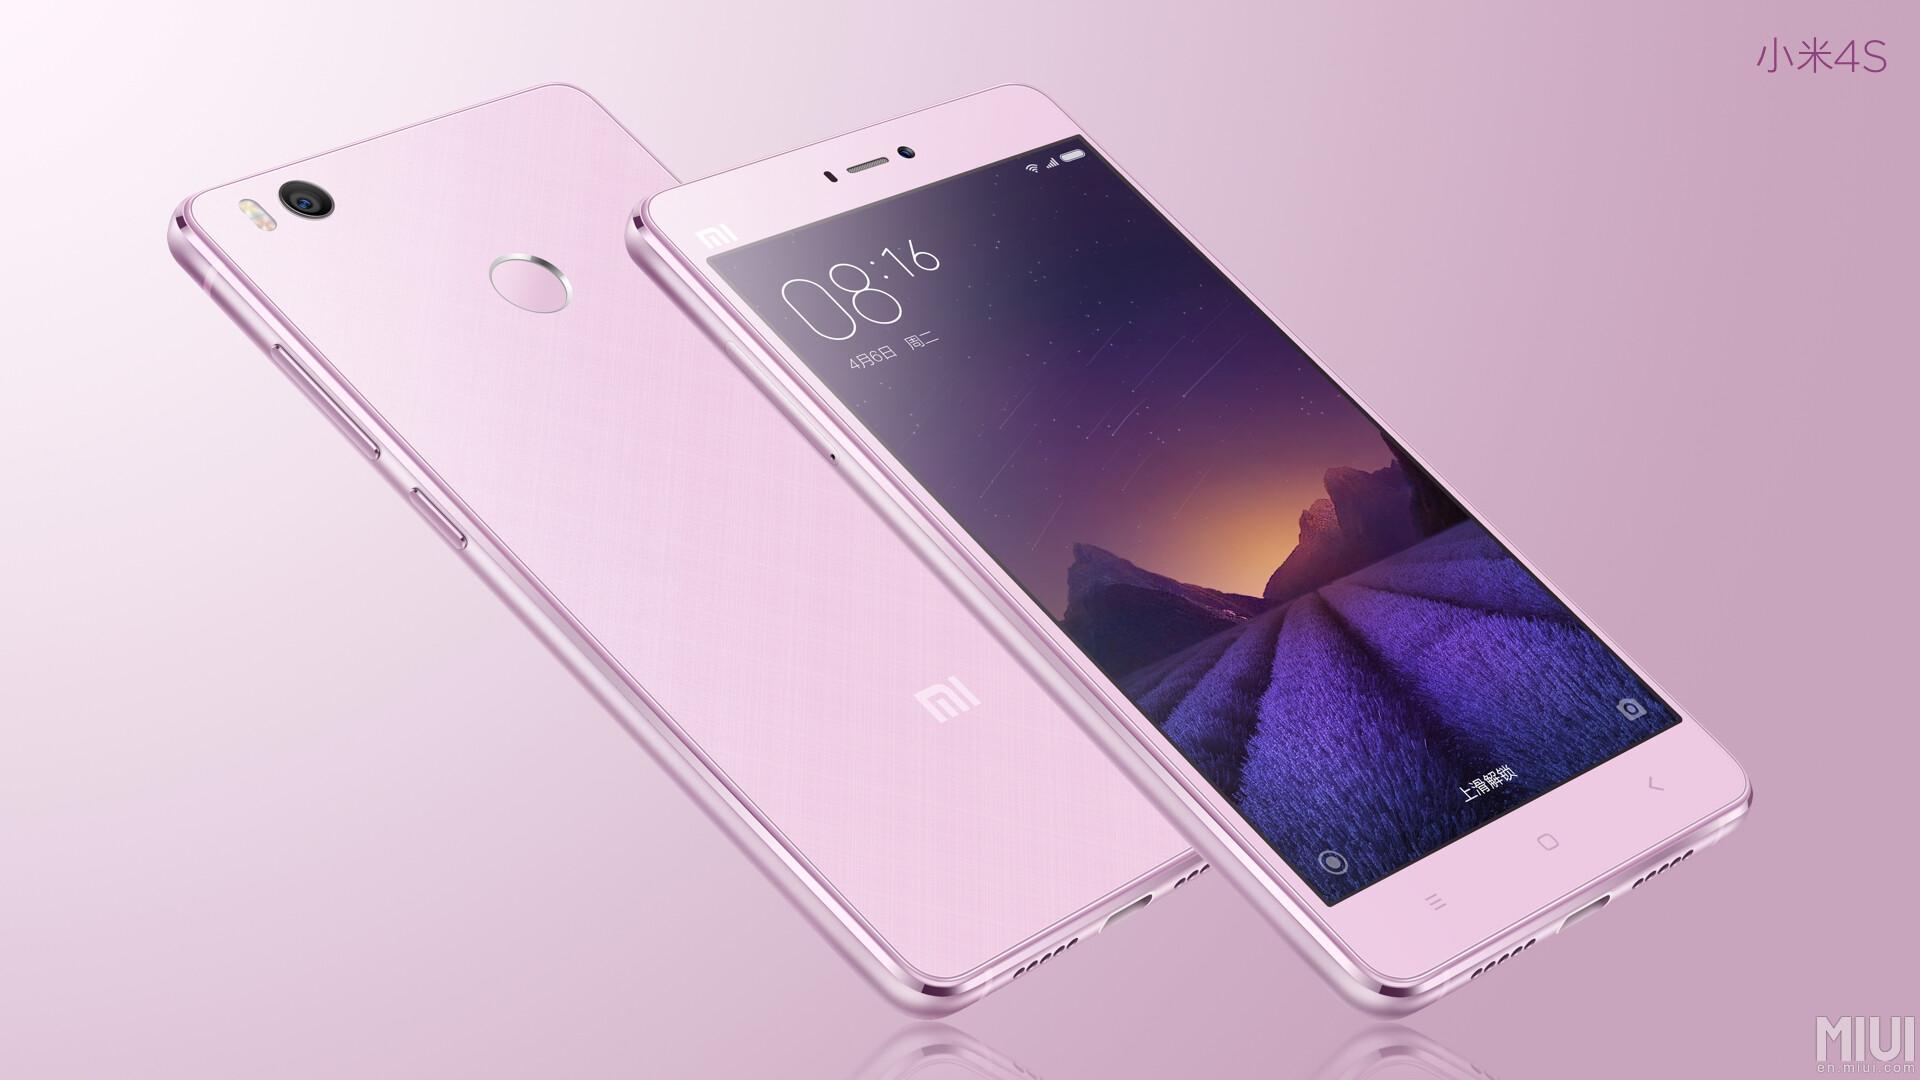 New Xiaomi Mi 4s price and release date - PhoneArena